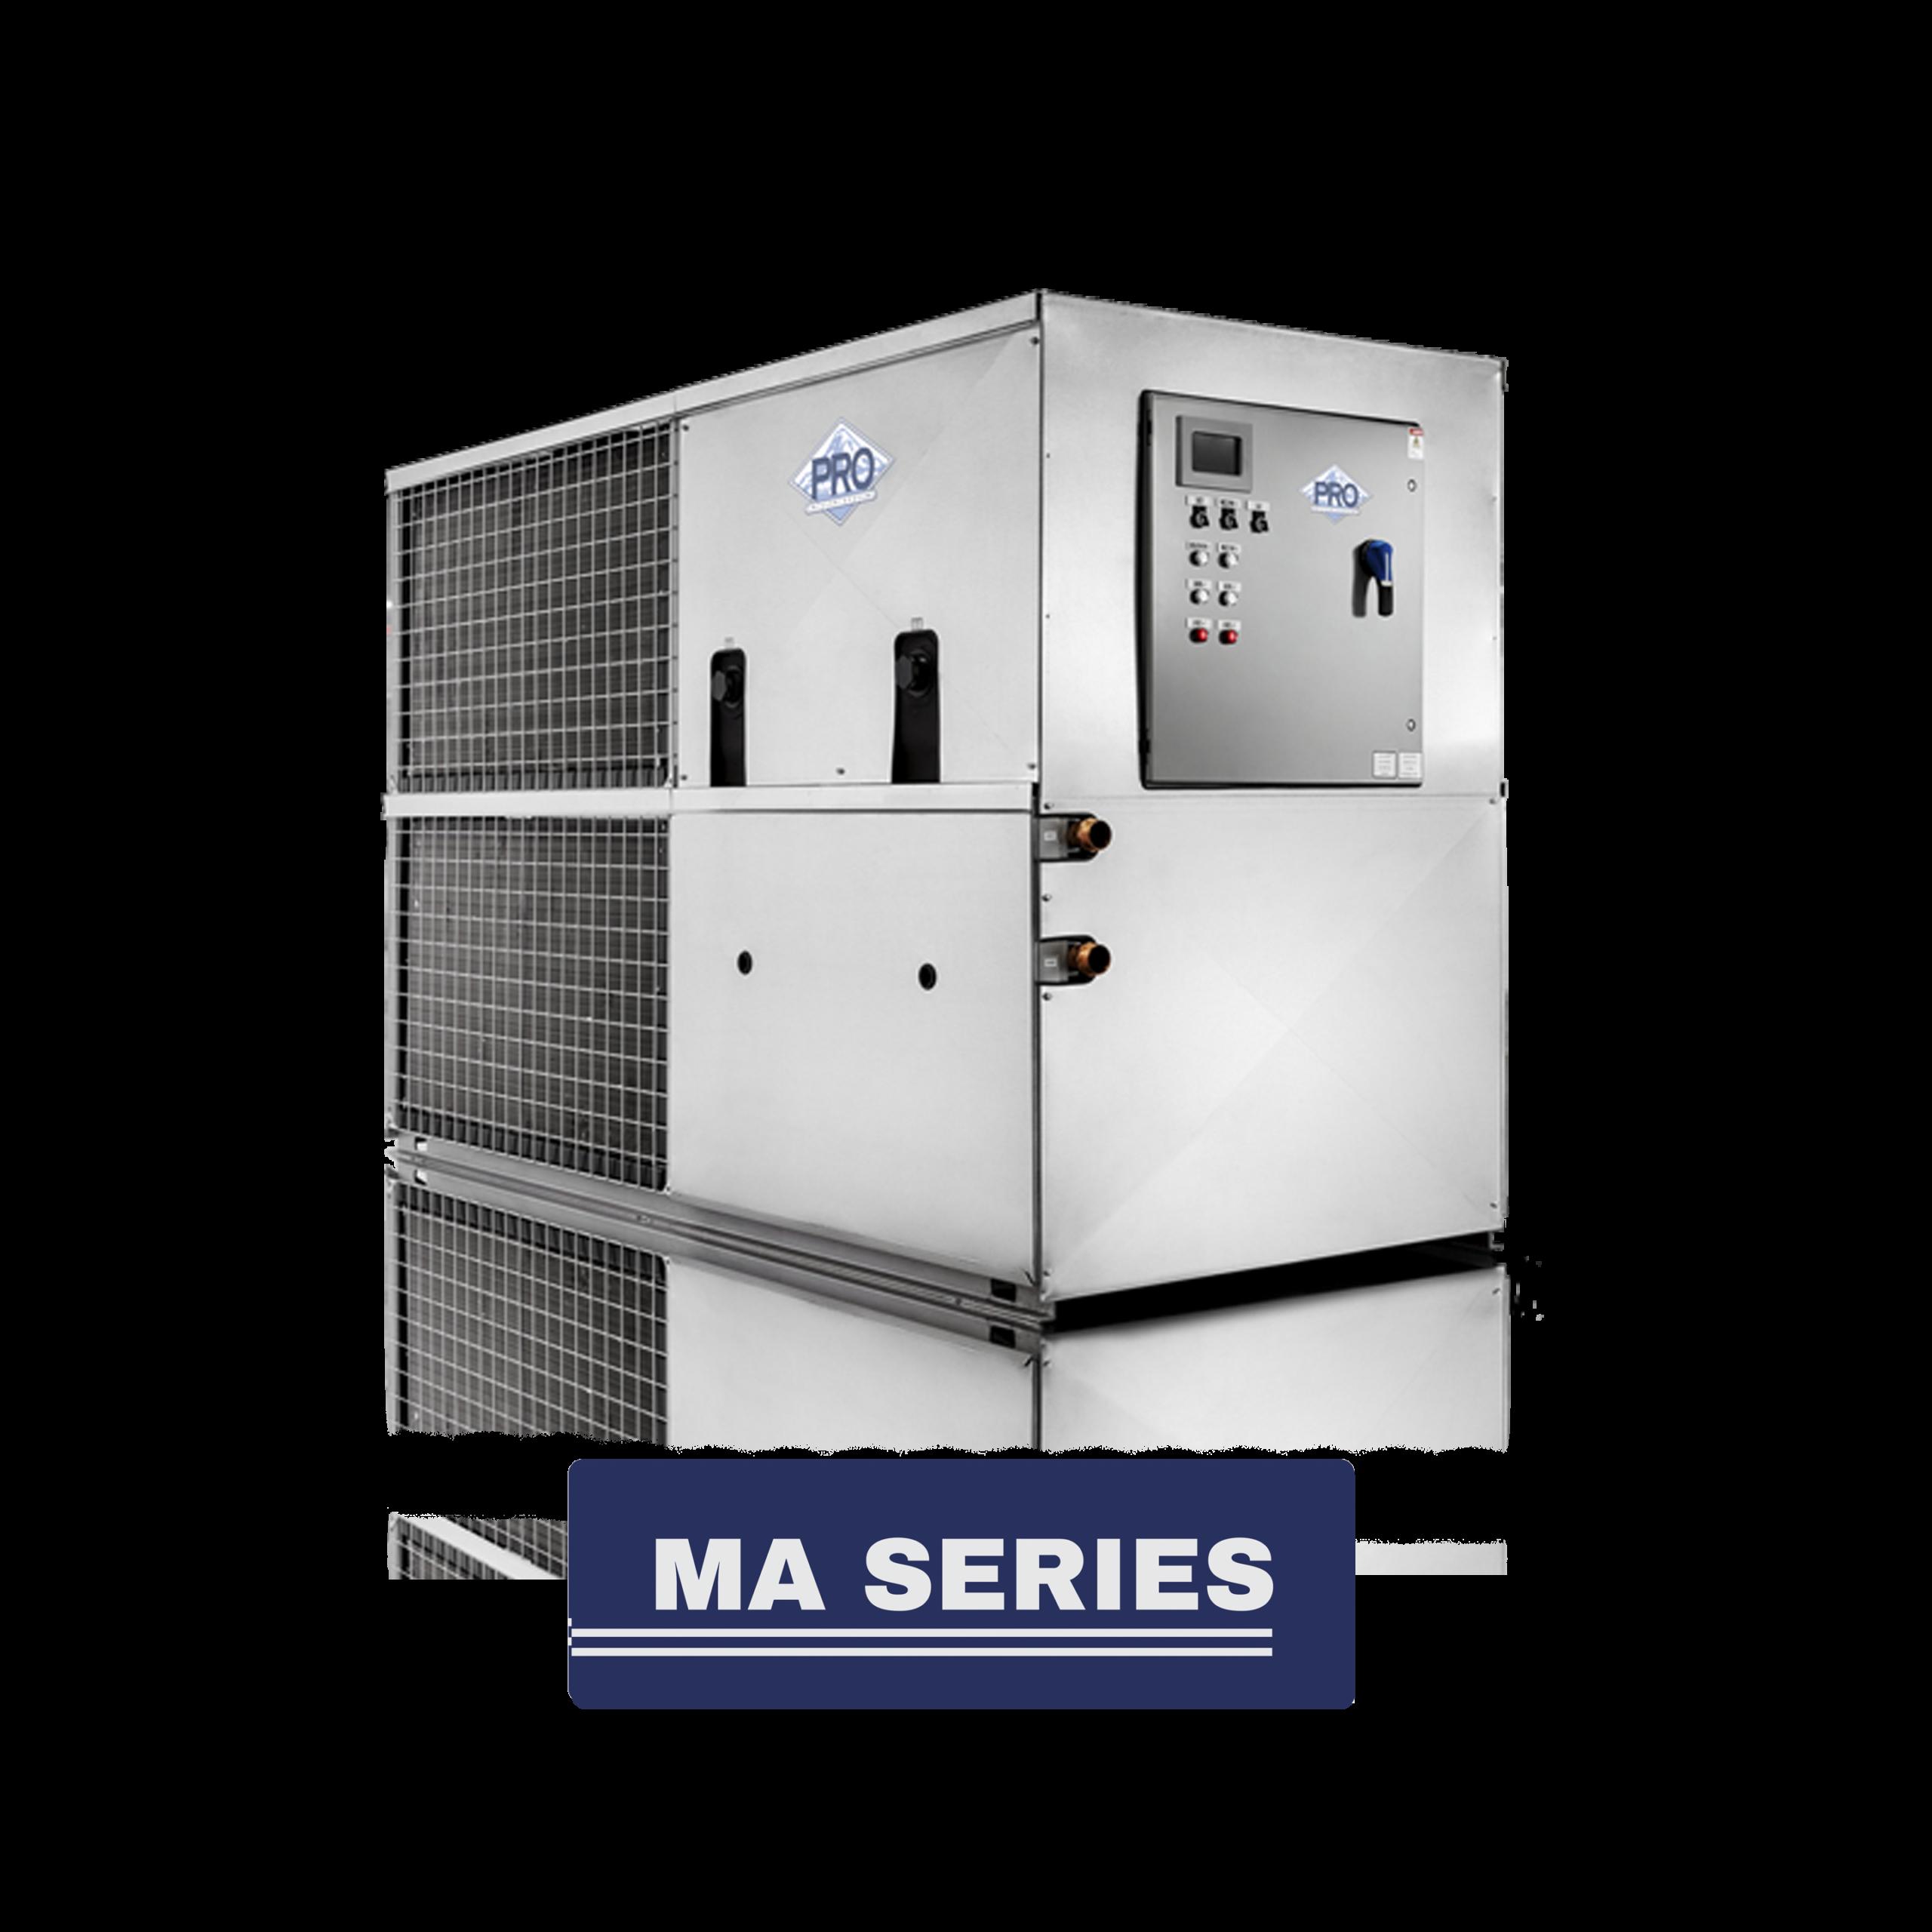 MA Series